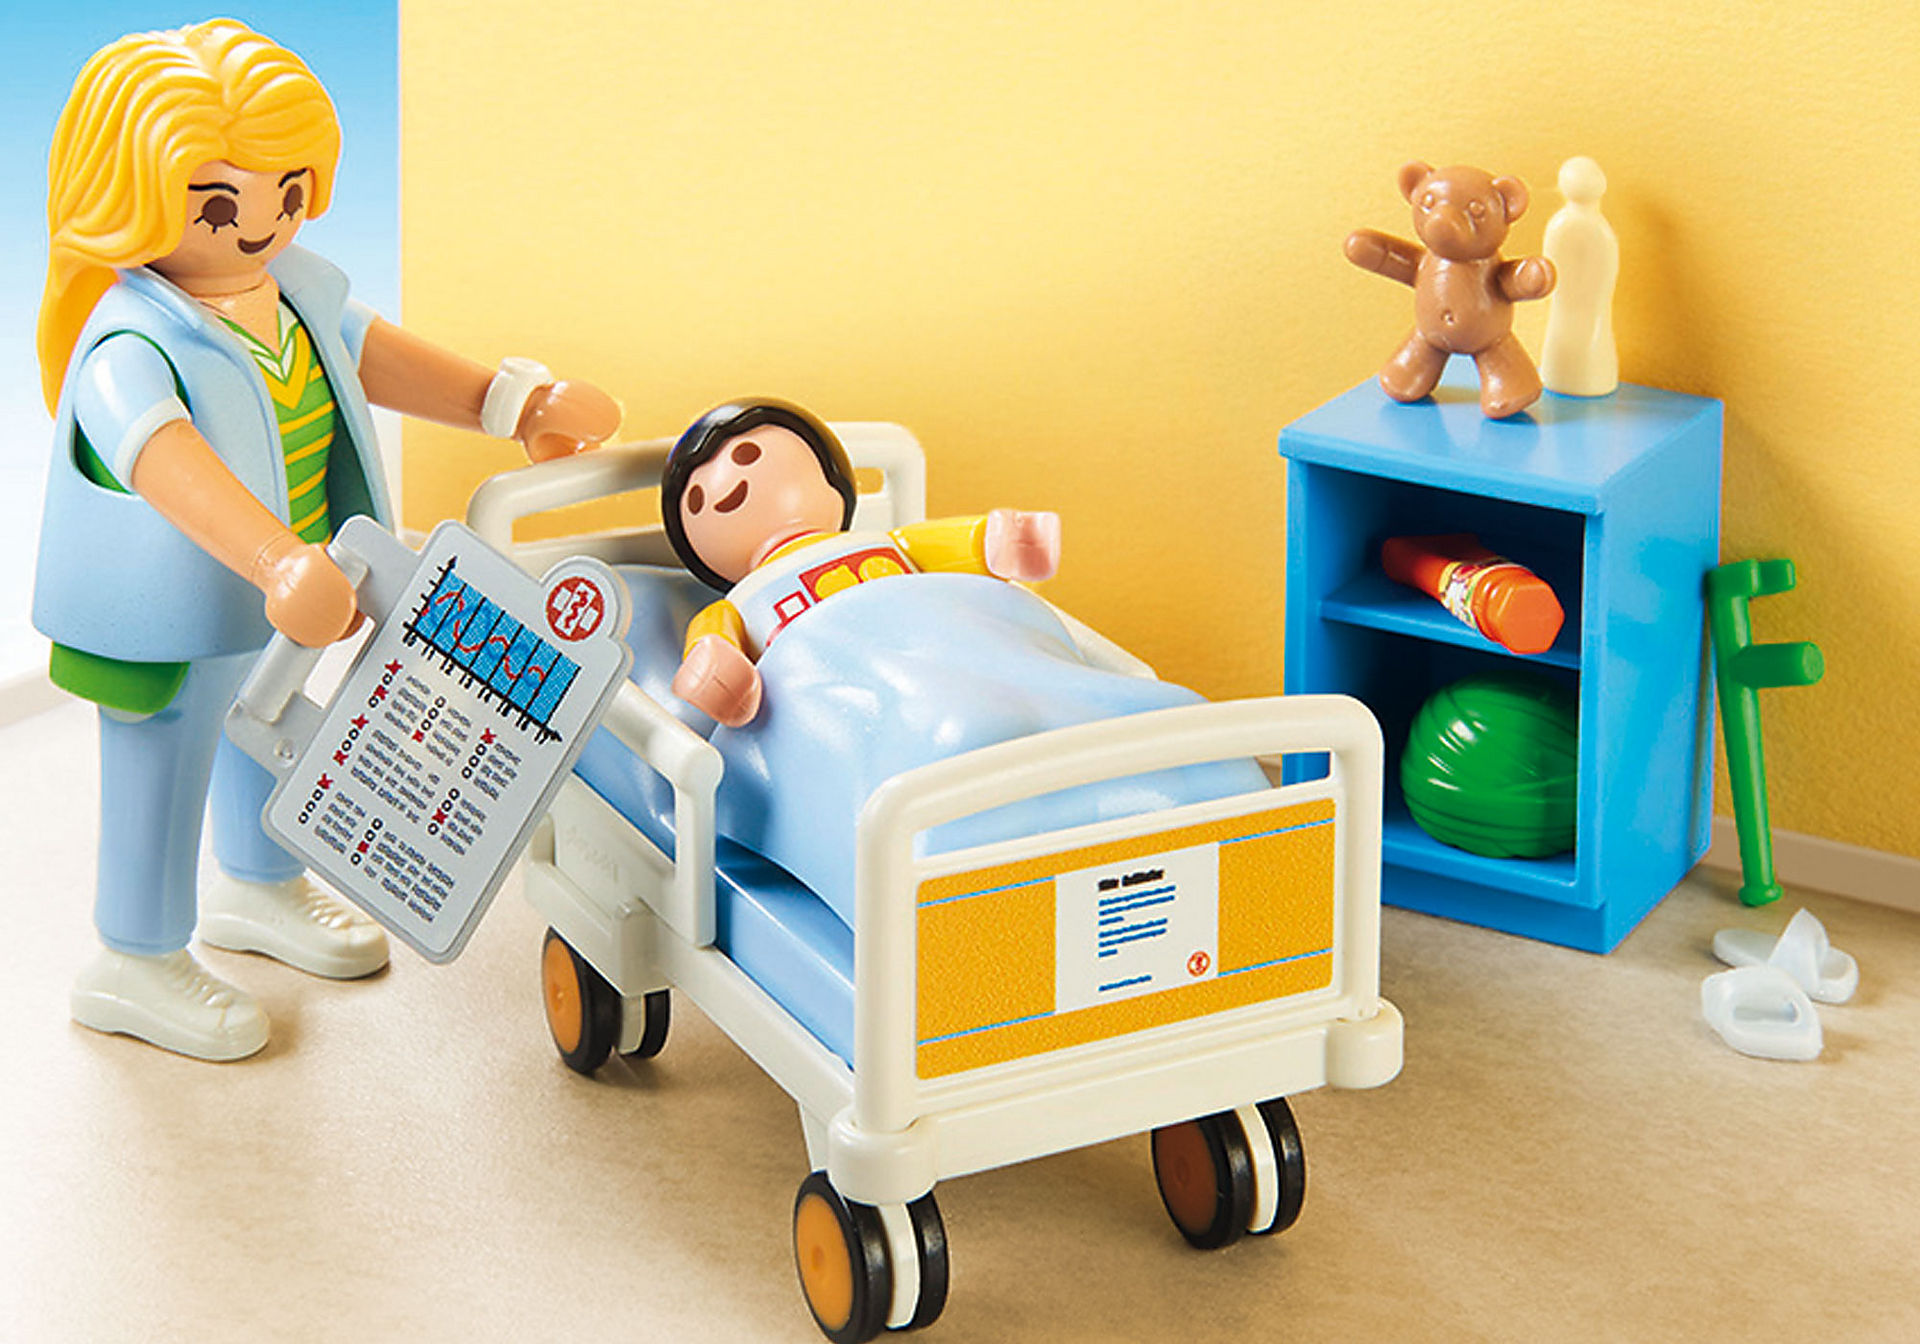 70192 Kinderkrankenzimmer zoom image5